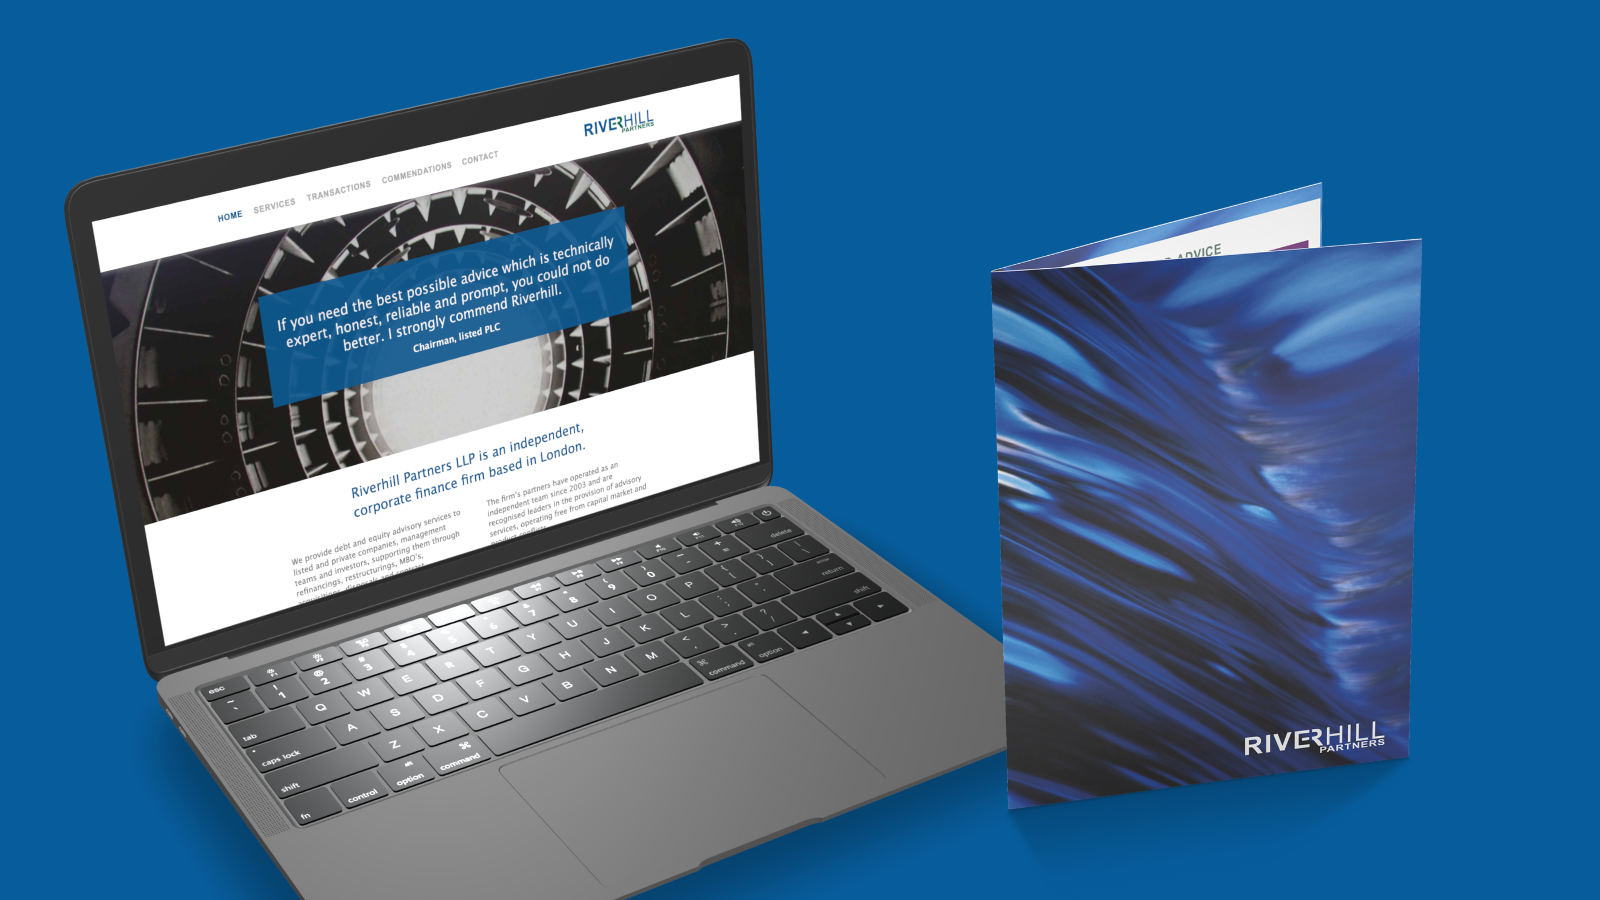 Riverhill Partners website and folder